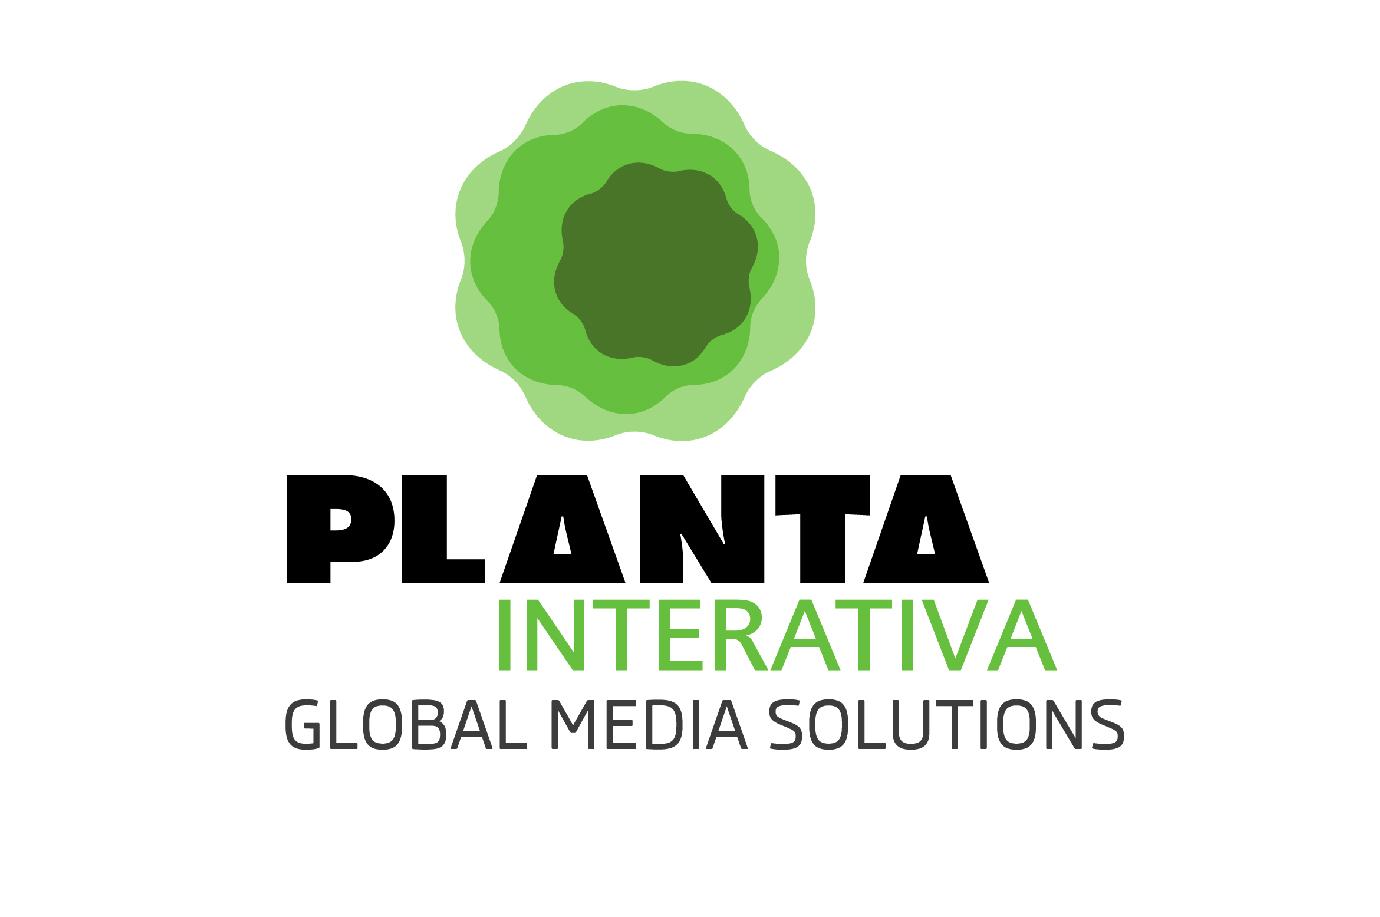 planta interativa-43